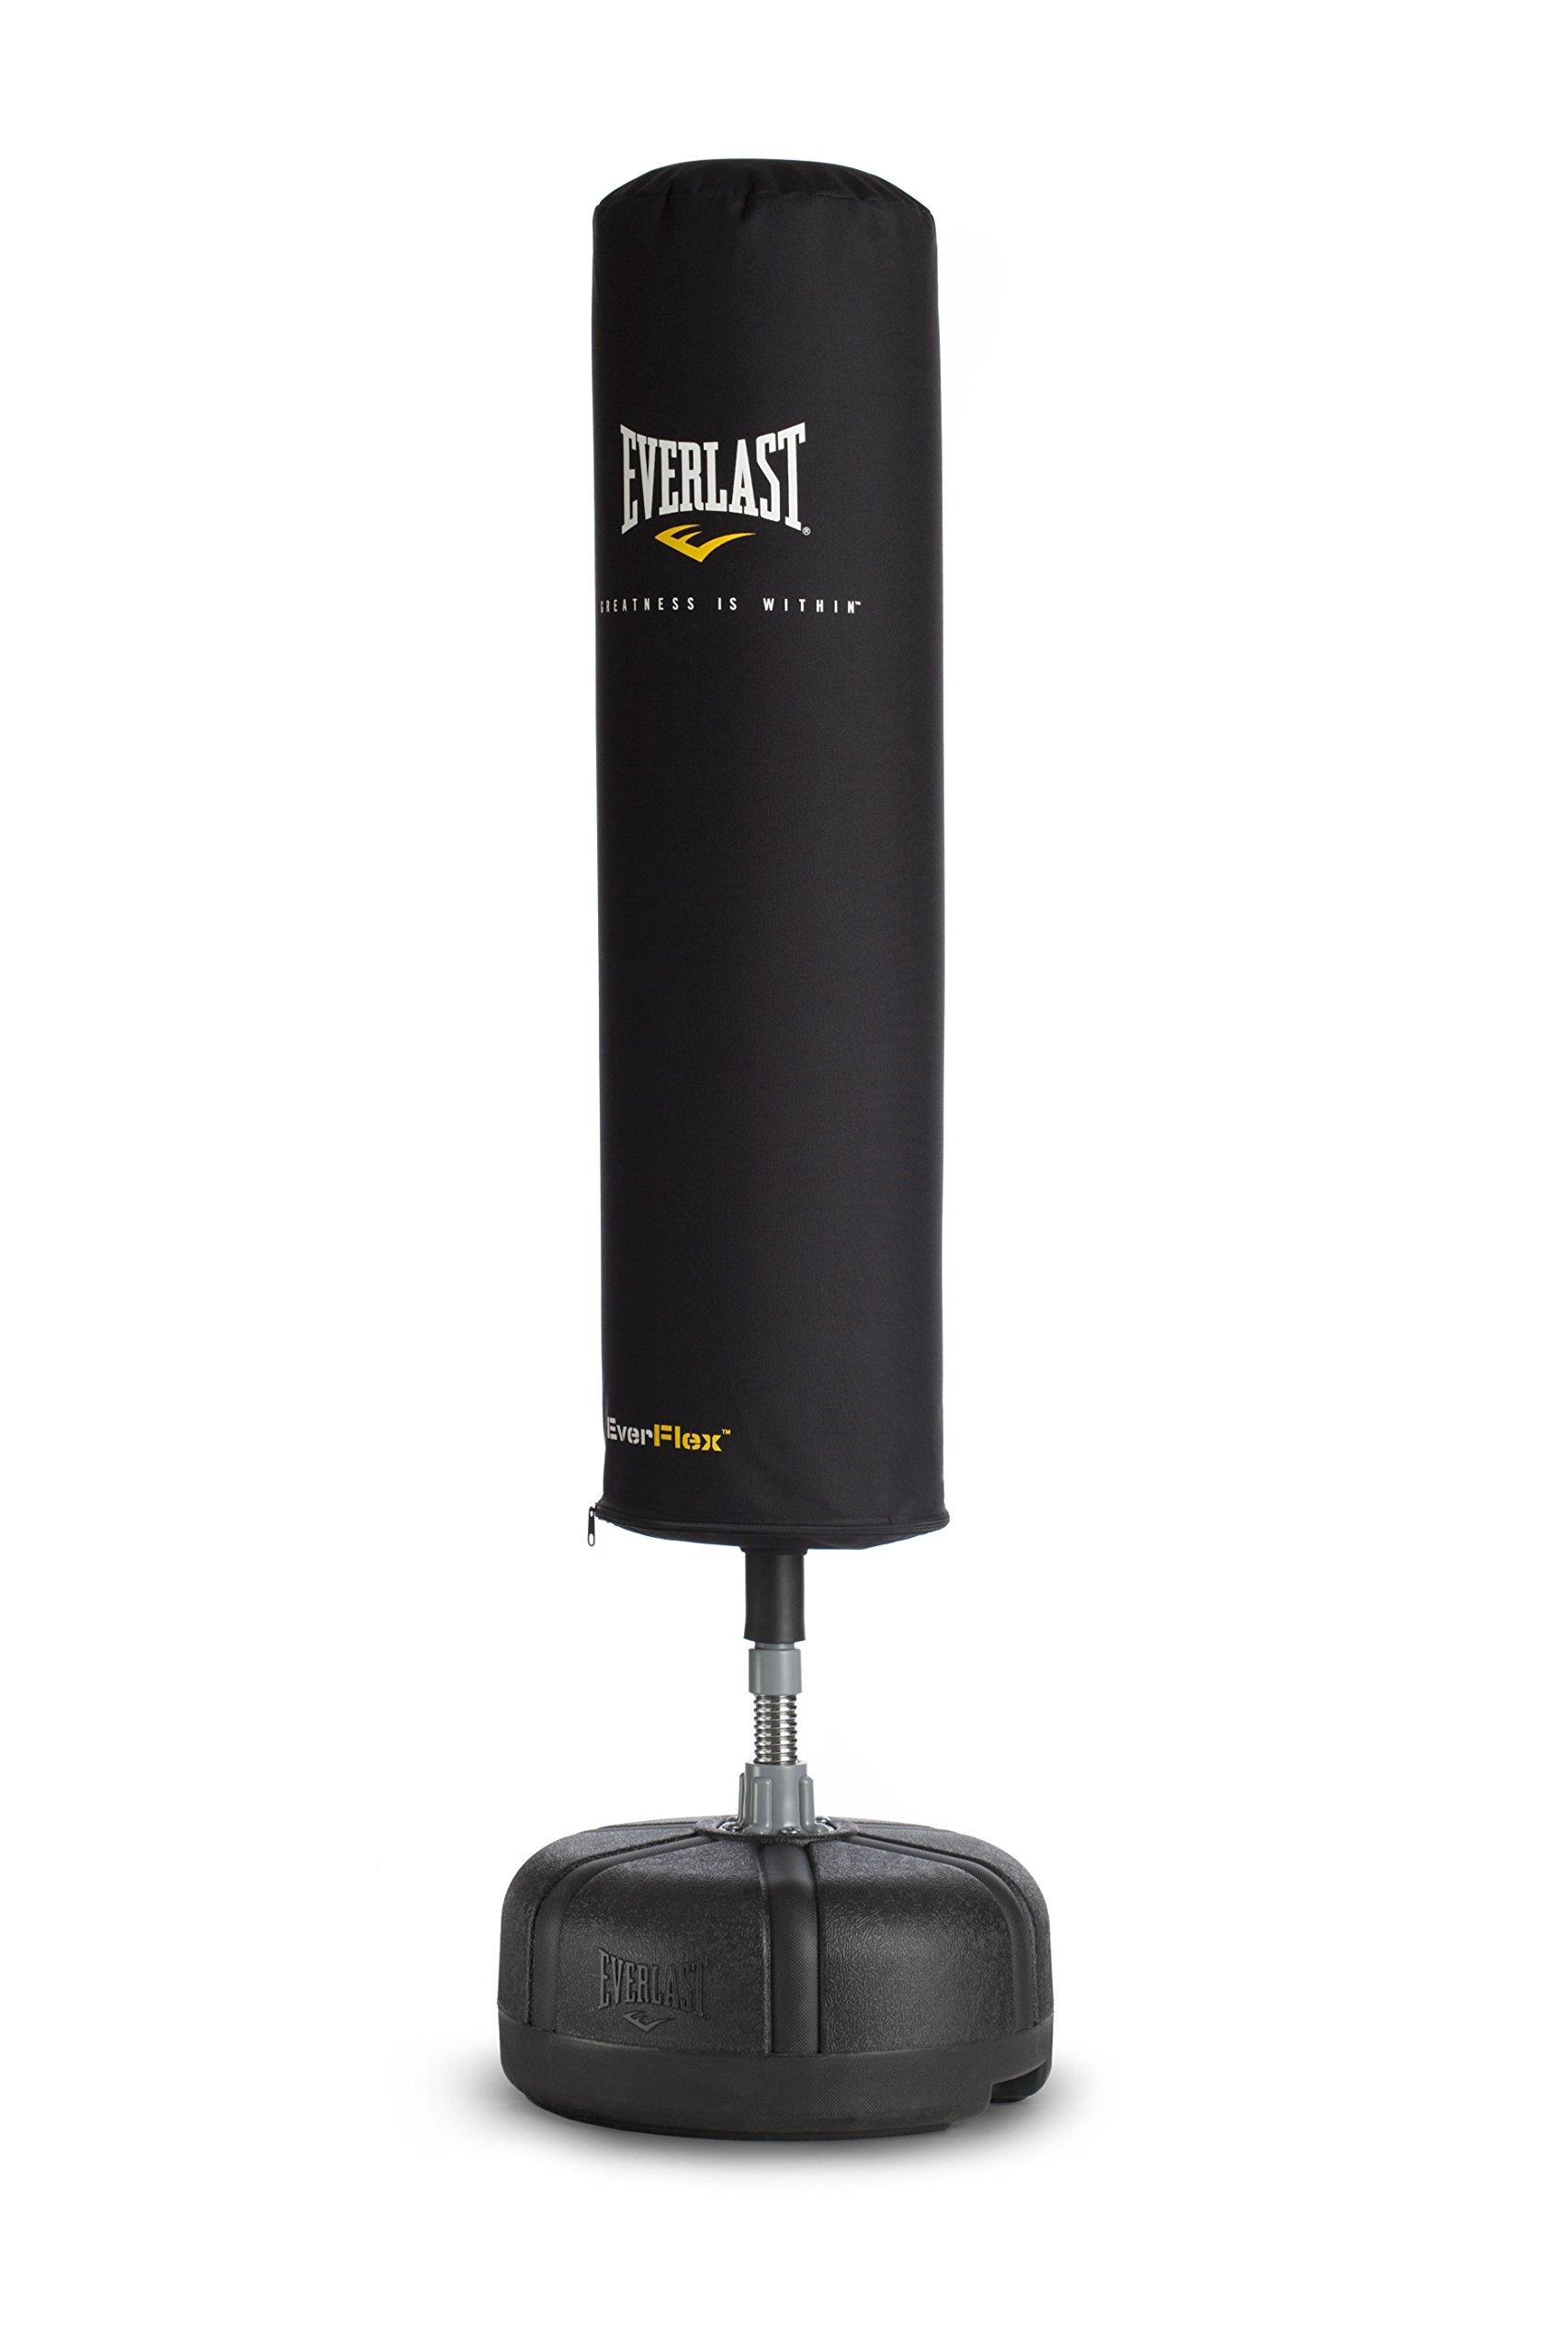 Everlast 2262 Adults Floor Standing Punching Bag 1 Size Black Buy Online In United Arab Emirates At Desertcart Ae Productid 49615025